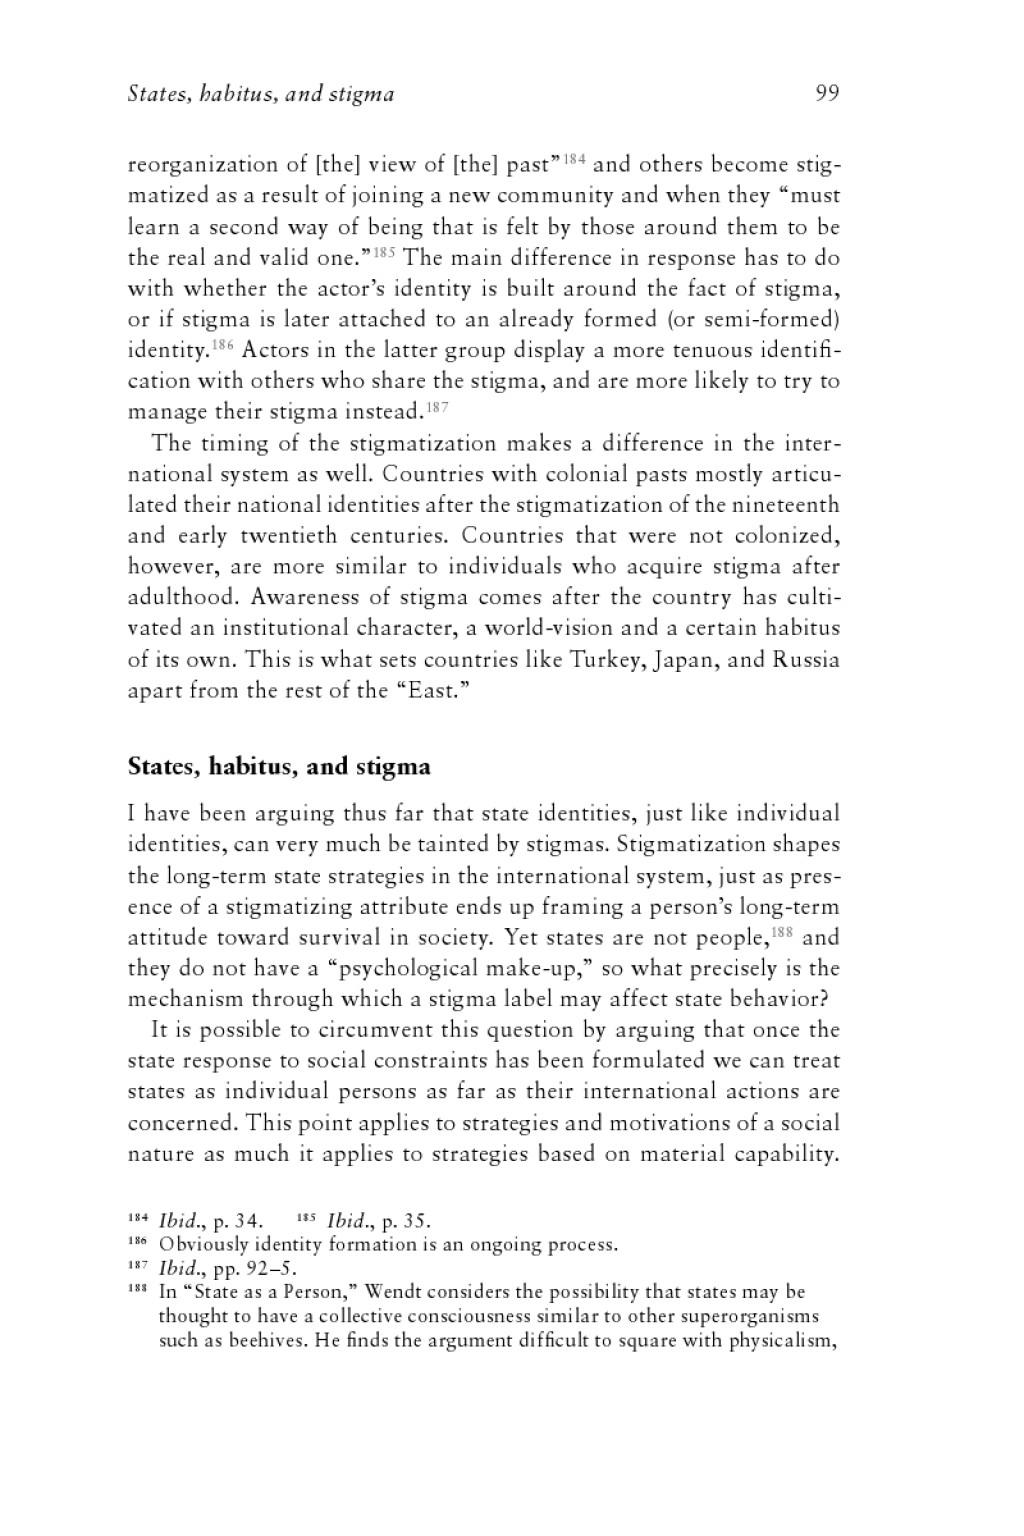 012 Zarakol National Honor Society Application Essay Sensational Examples Service Junior Scholarship Large